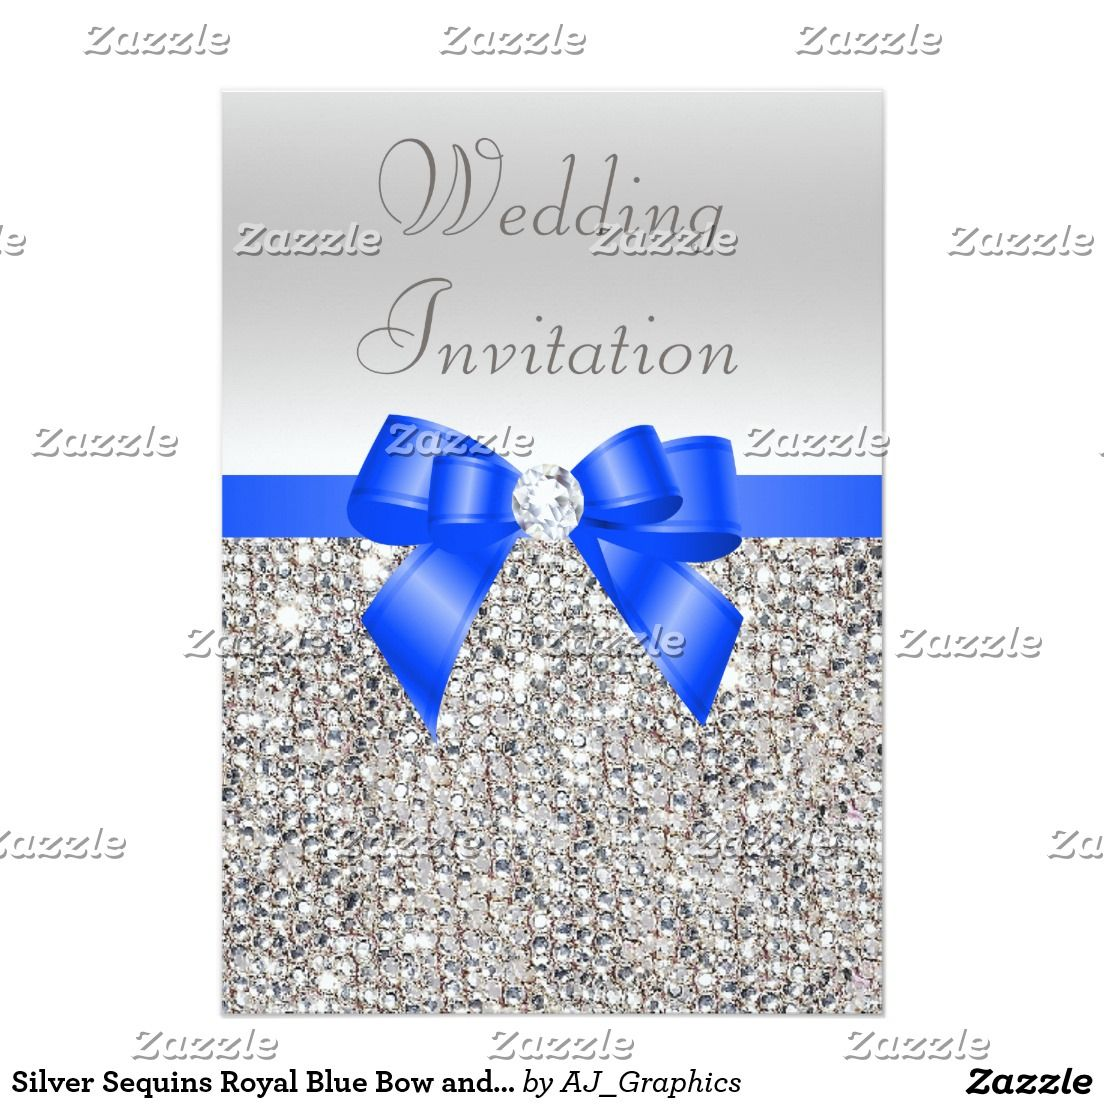 Silver Sequins Royal Blue Bow And Diamond Wedding Invitation